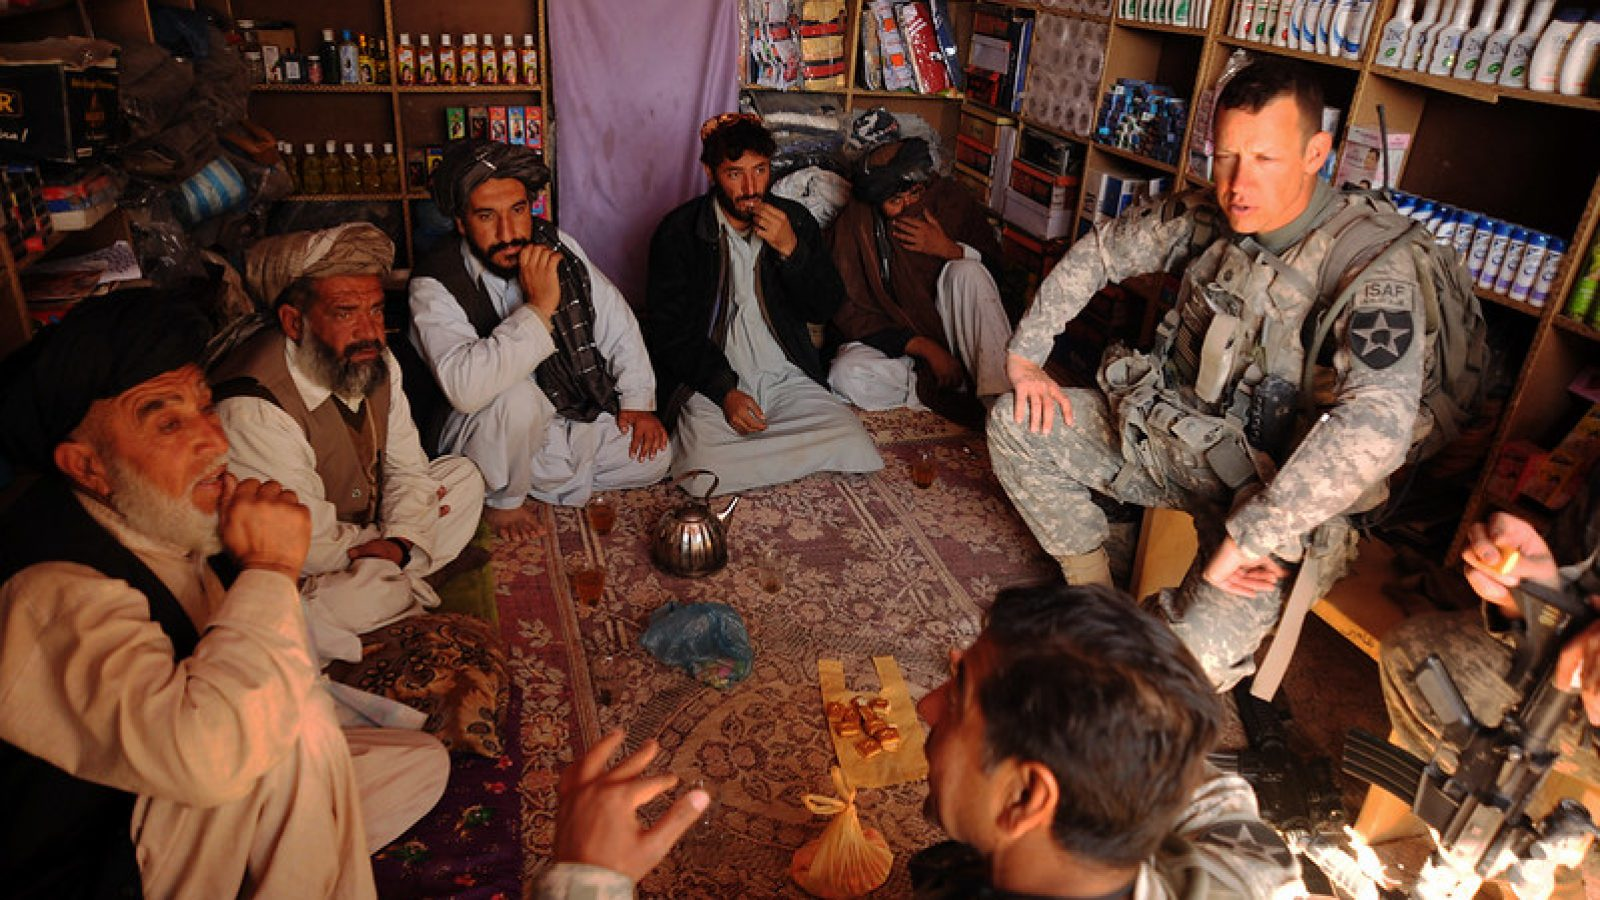 U.S. Army Lt. Col. Burton Shields, commander of 4th Battalion, 23rd Infantry Regiment, and his translator, hold a key leader engagement in Karezgay, Afghanistan